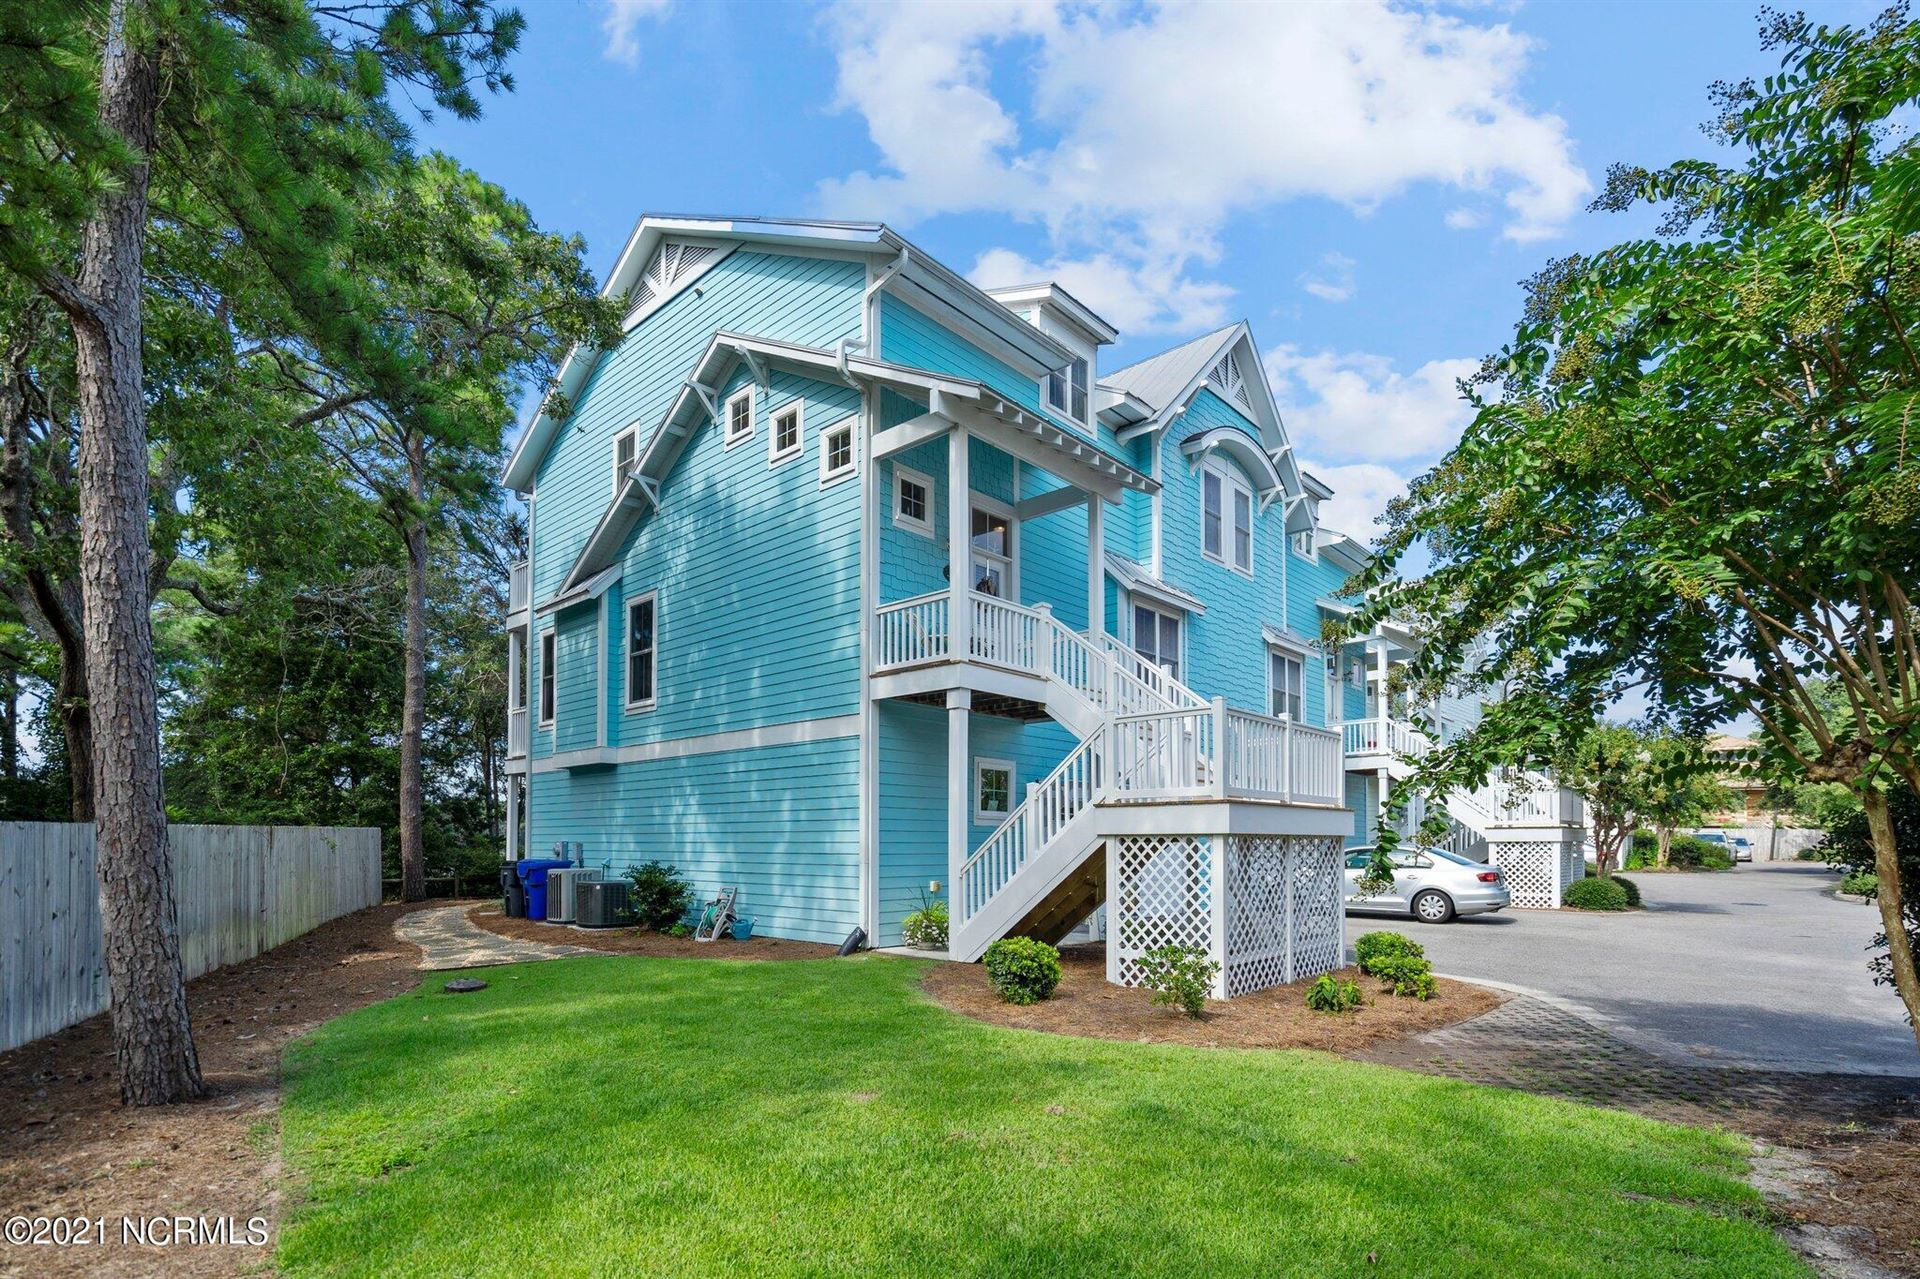 Photo for 518 Spencer Farlow Drive #3, Carolina Beach, NC 28428 (MLS # 100285505)